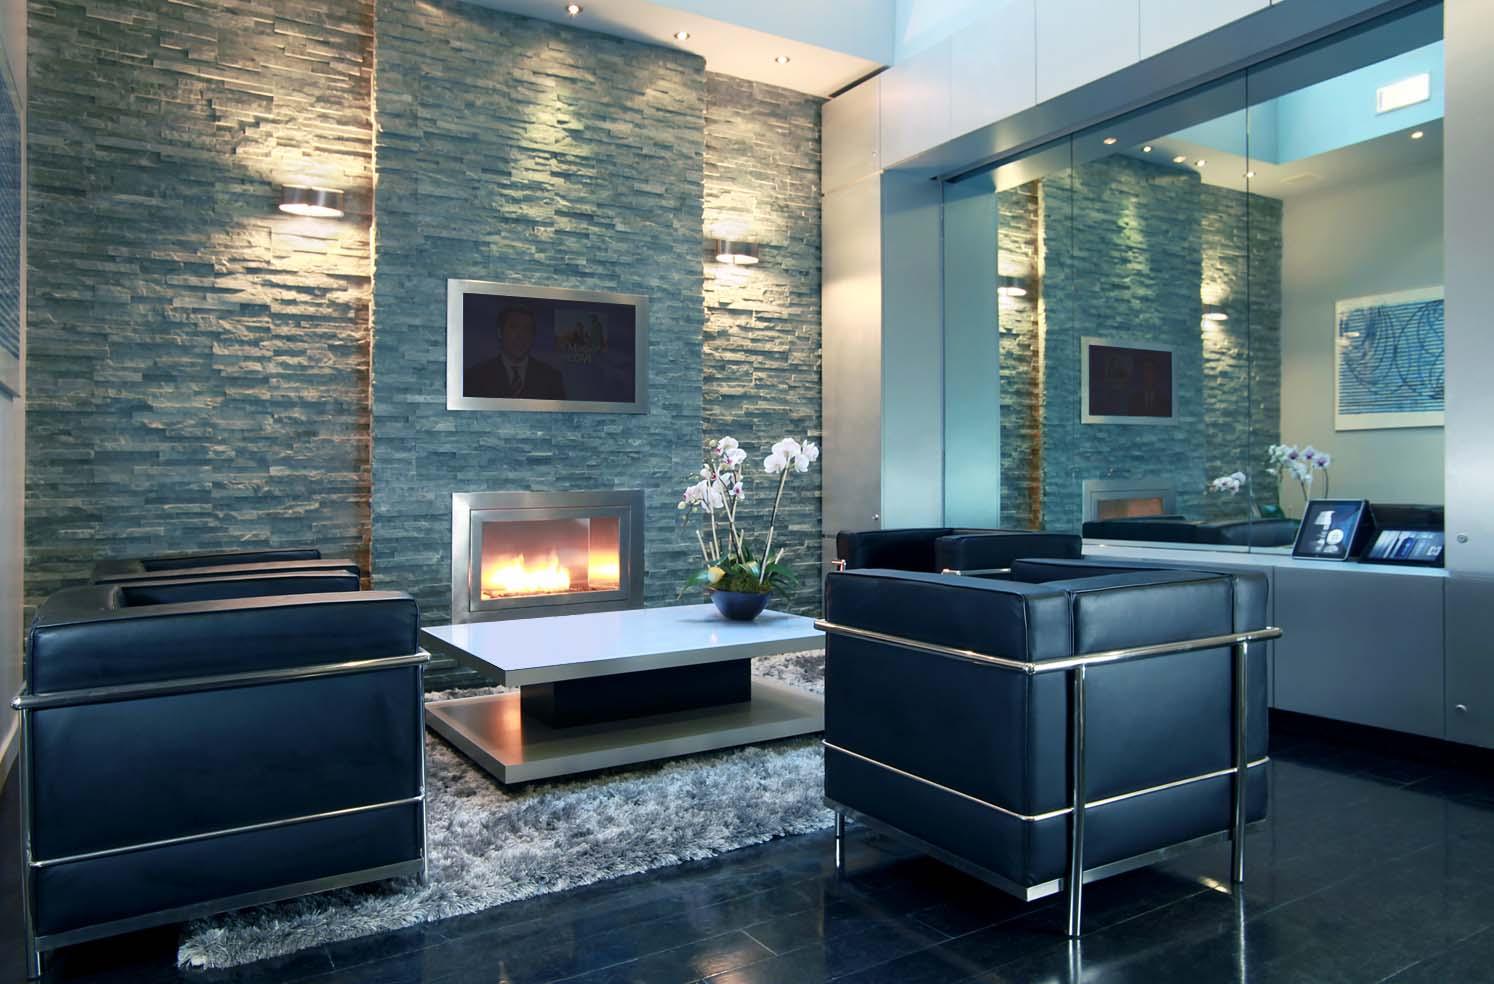 Ventless gel fuel fireplaces - Best Fireplace Design Ideas: Ventless Gel Fuel Fireplaces